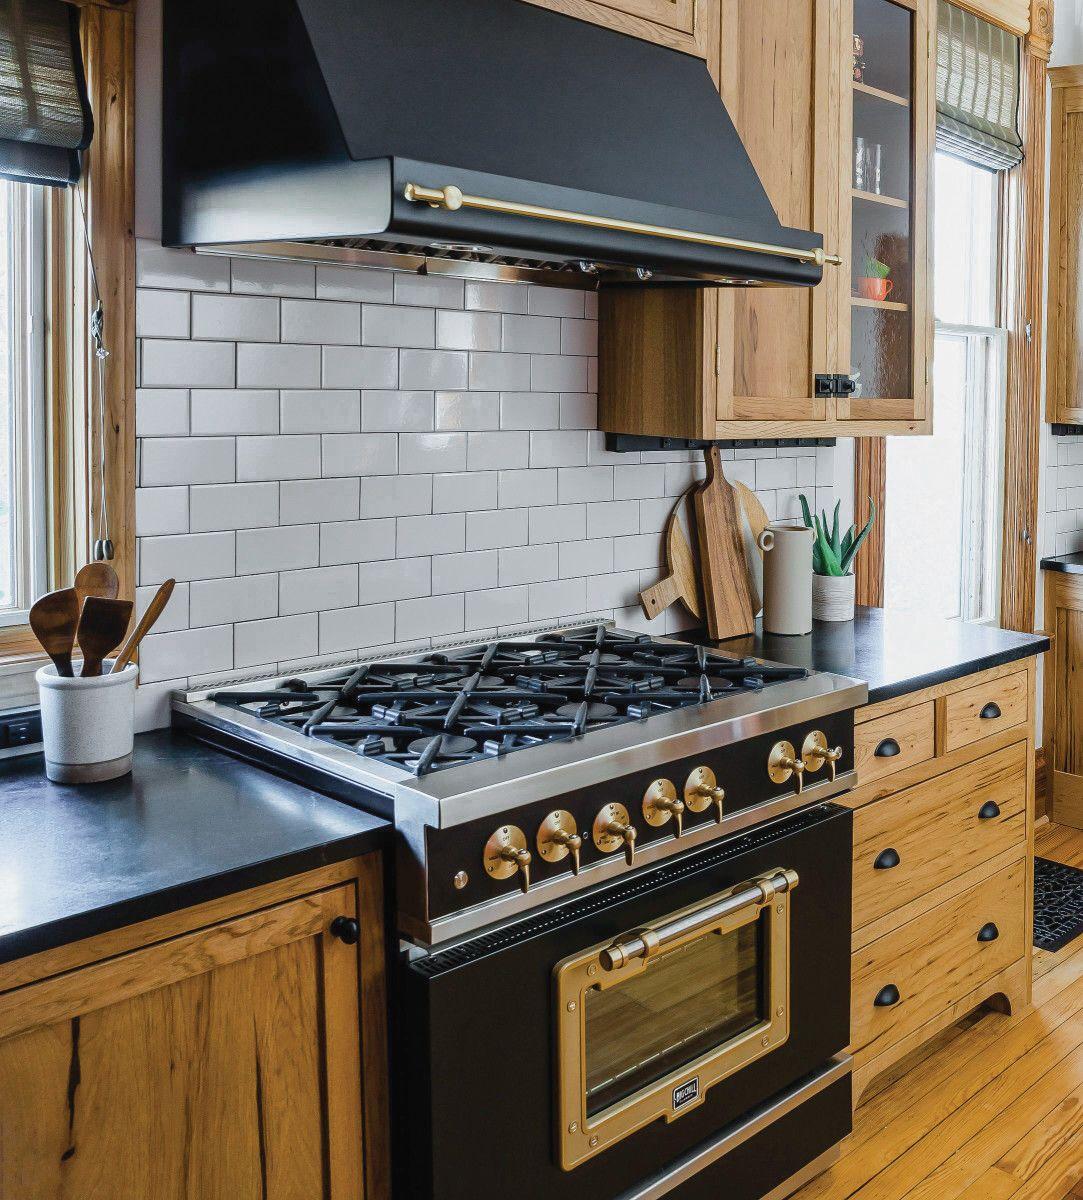 Hickory In A Retro Kitchen Retro Kitchen Hickory Cabinets Kitchen Design